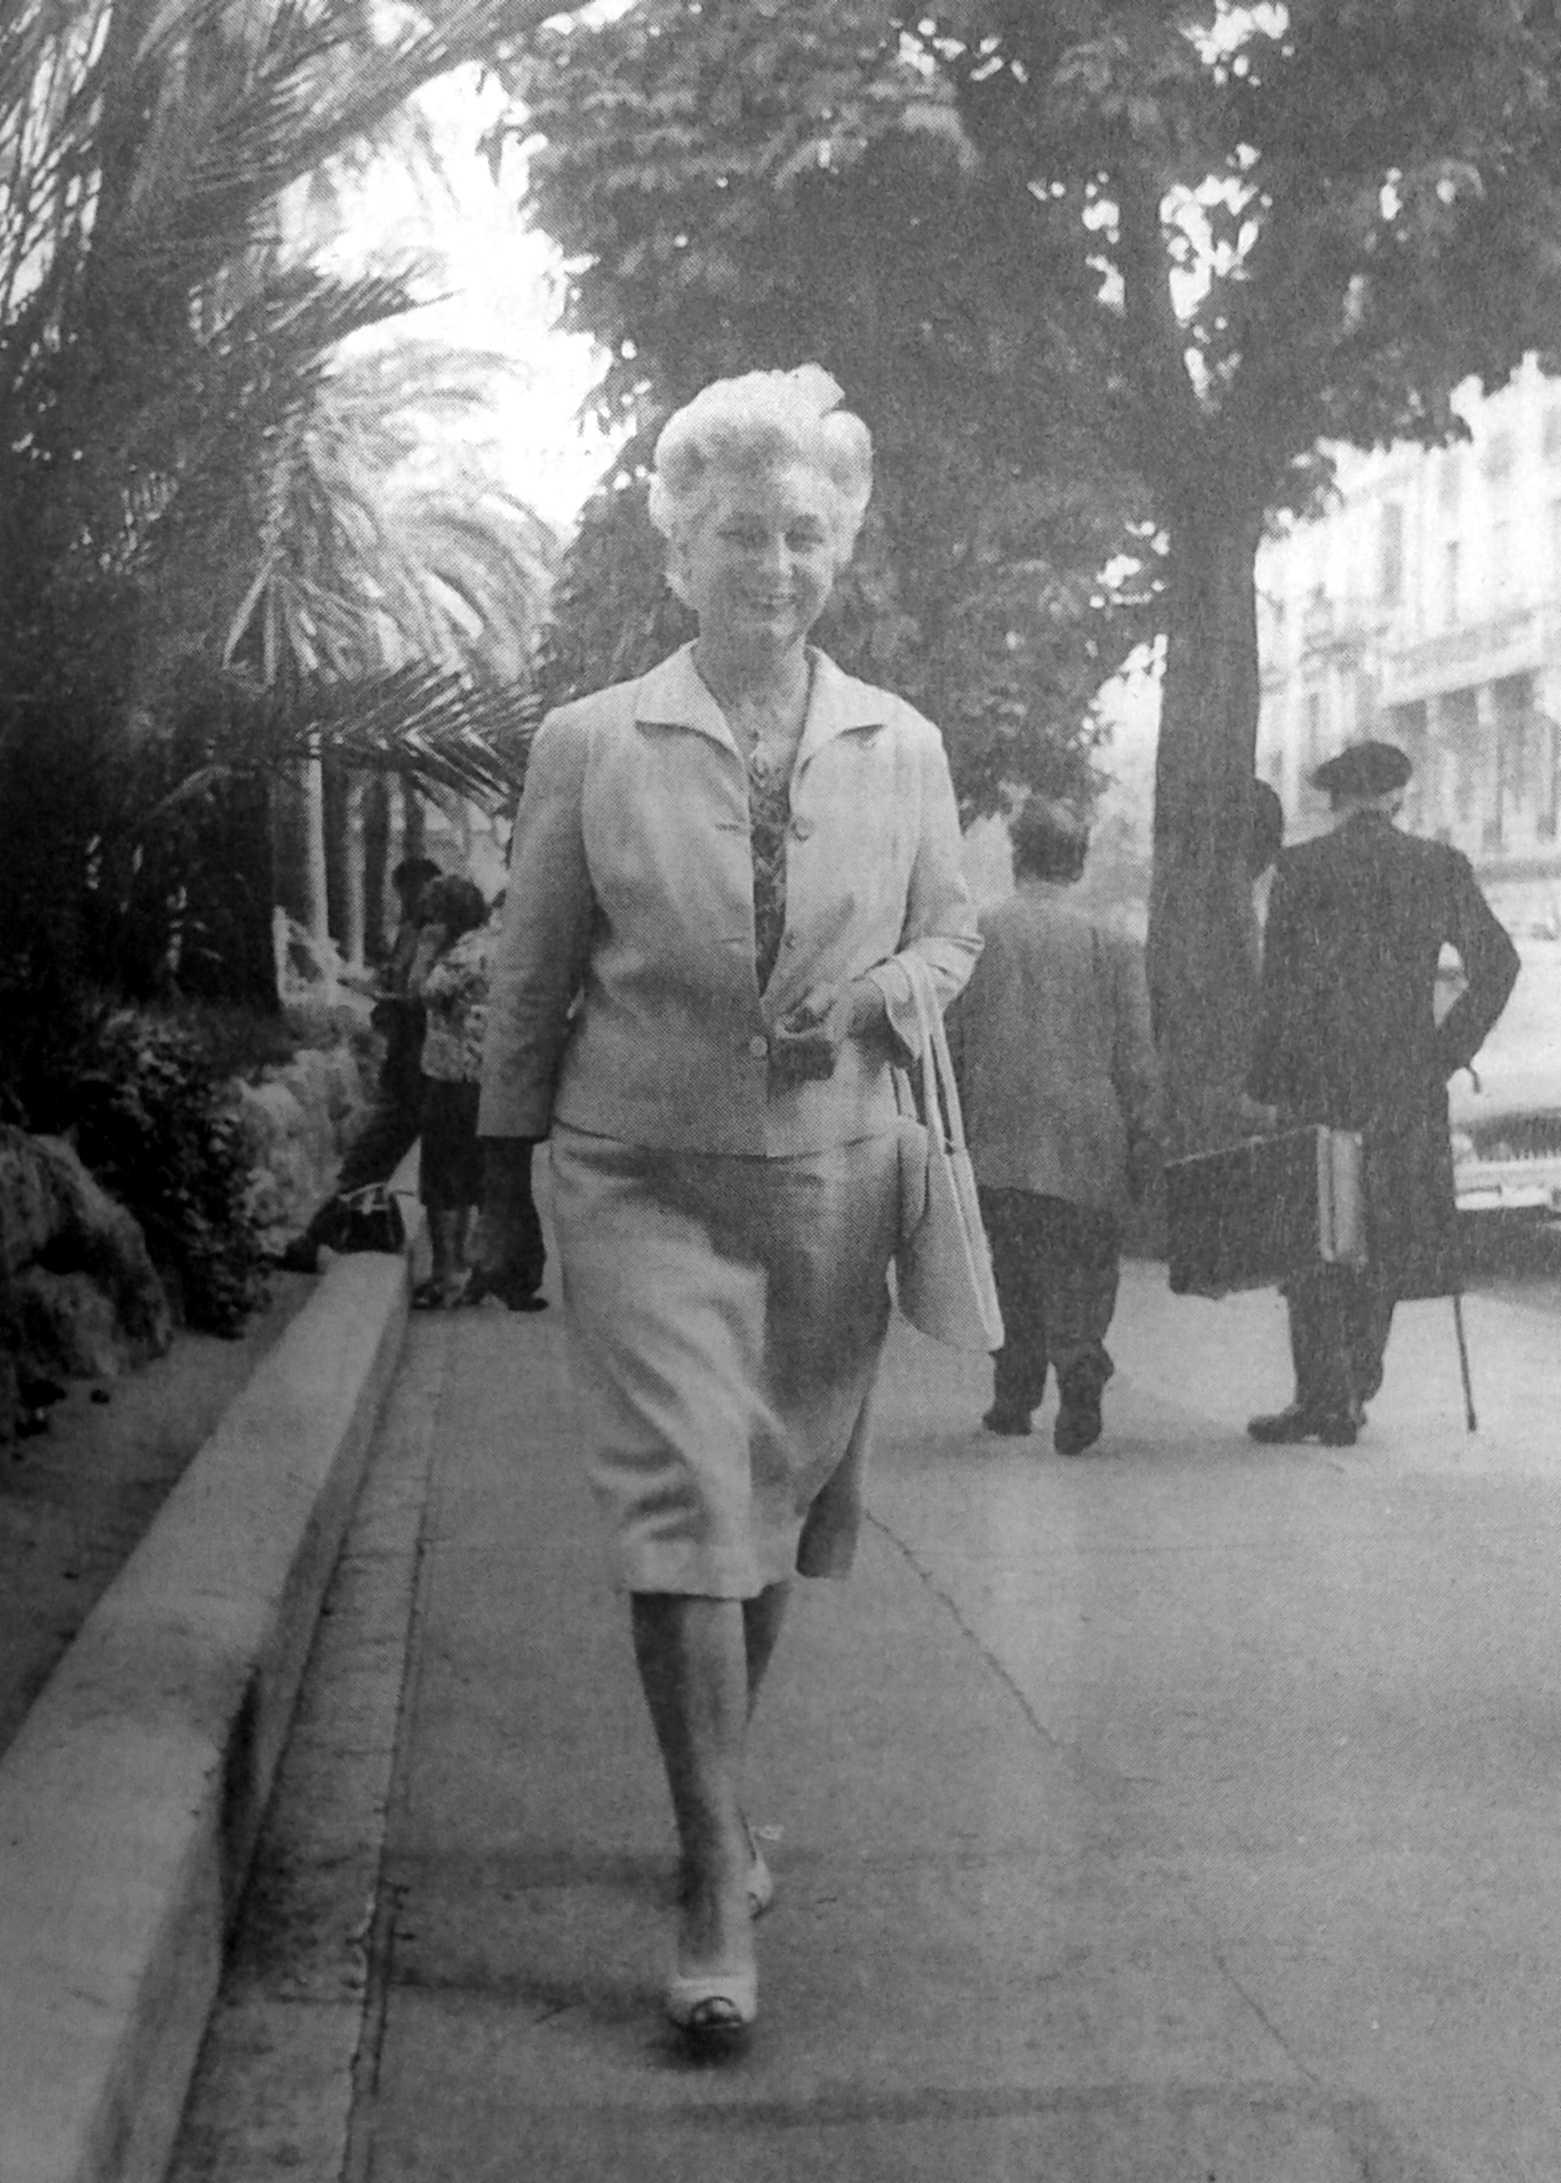 Hélène Patou (verano de 1962)